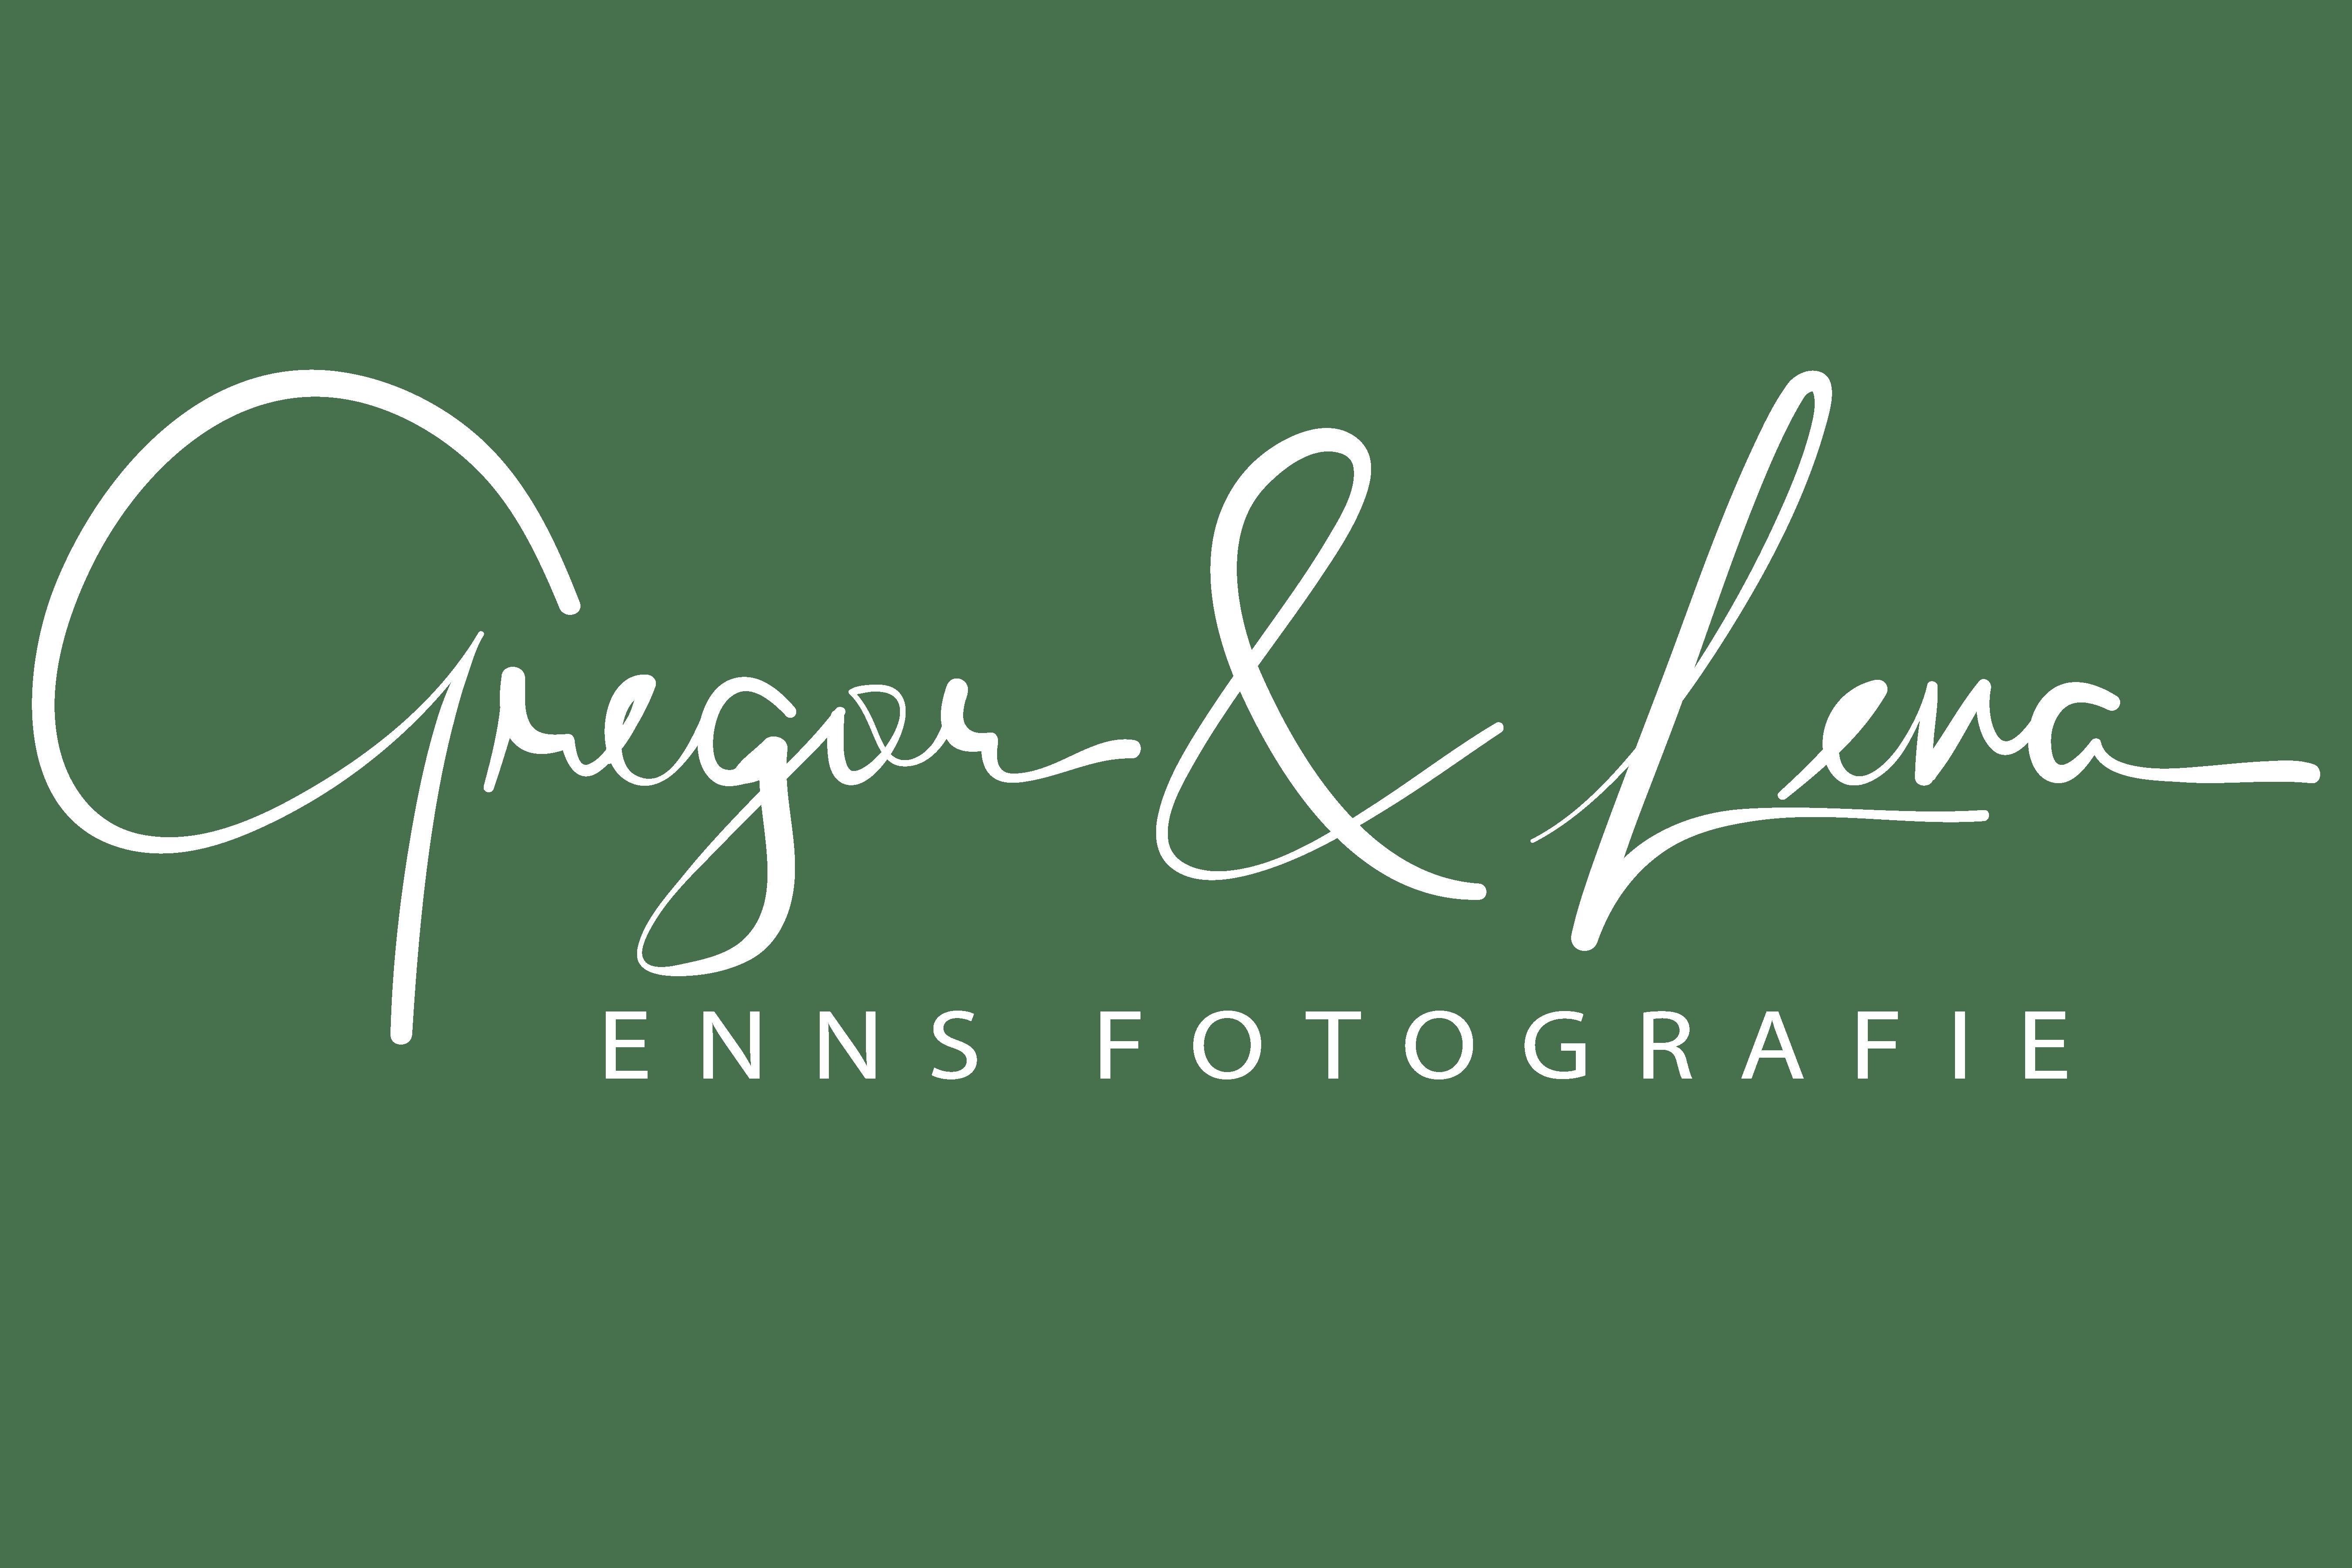 enns-fotografie_de